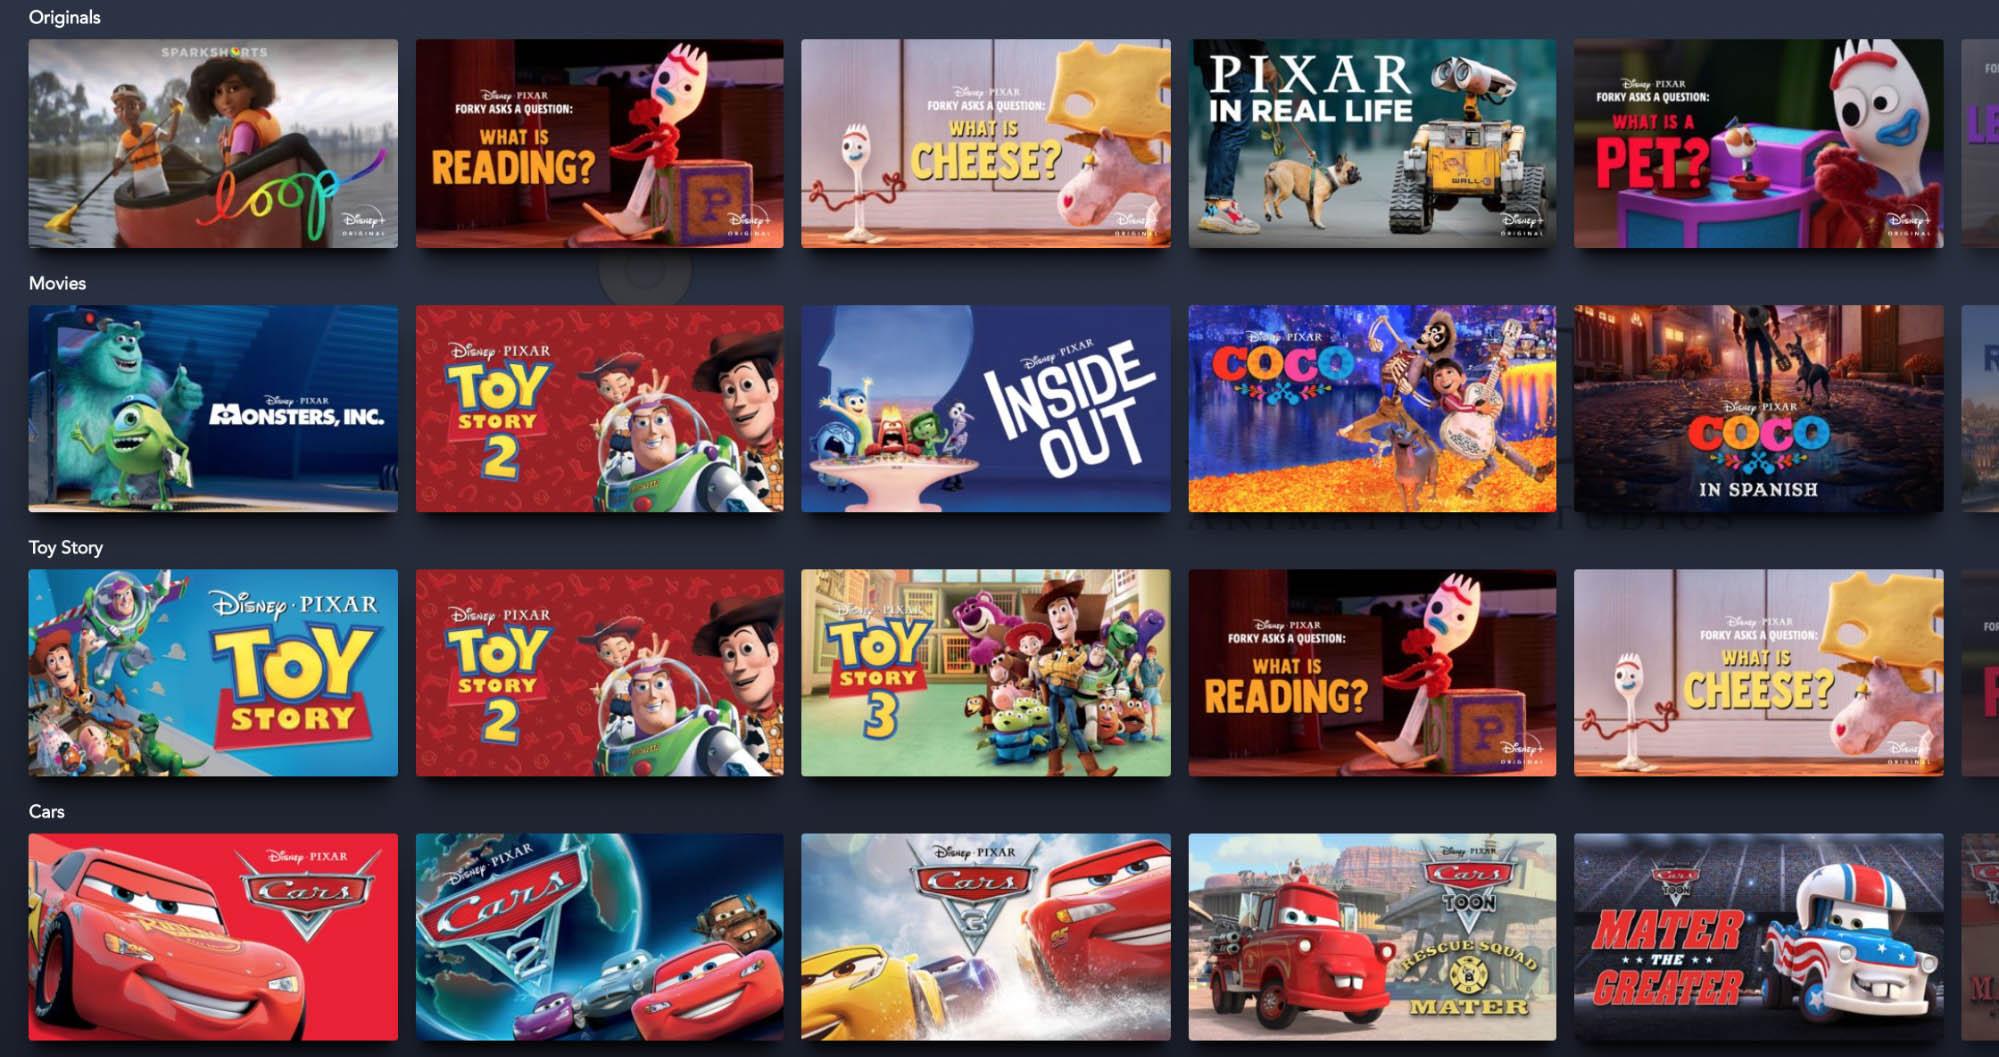 Trickut - disney plus free trial - Pixar movies - Deals Product Reviews Coupons